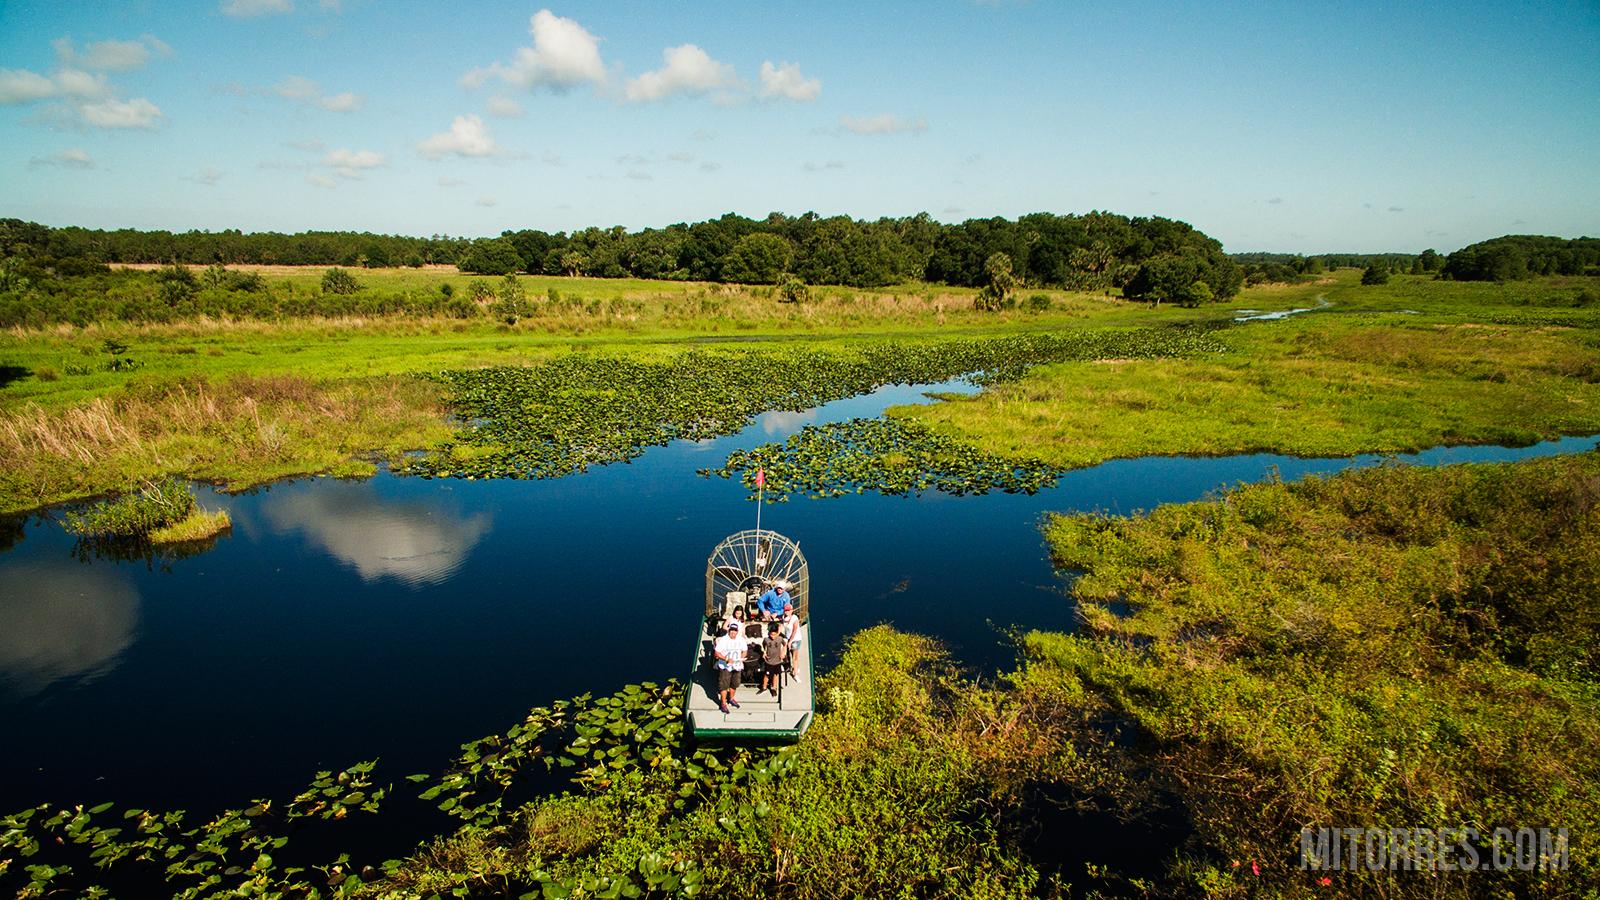 Lake Cypress, Florida Photo: Marlon I. Torres